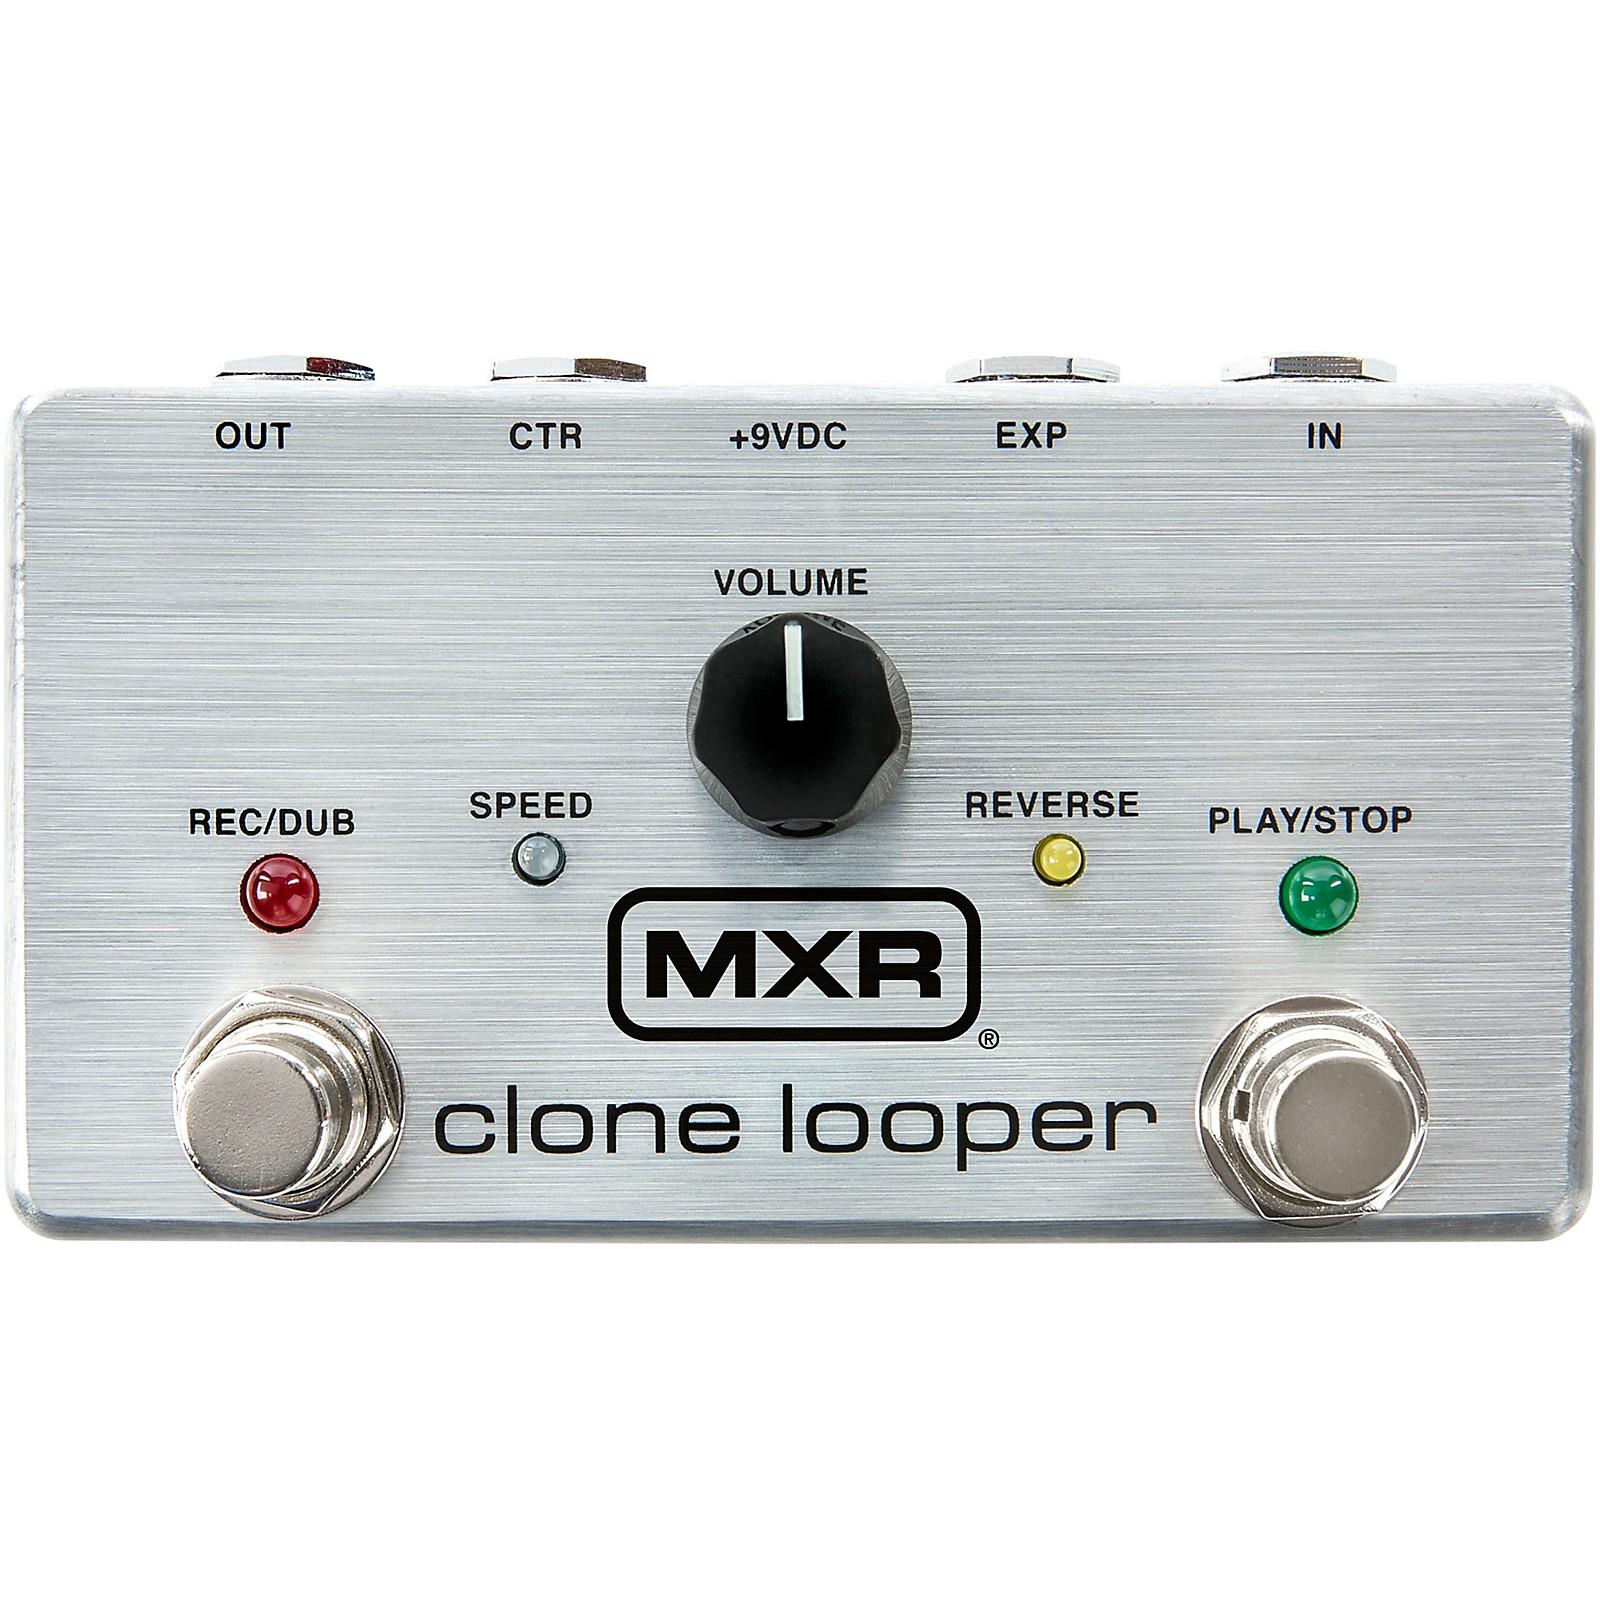 MXR M303 Clone Looper Effects Pedal